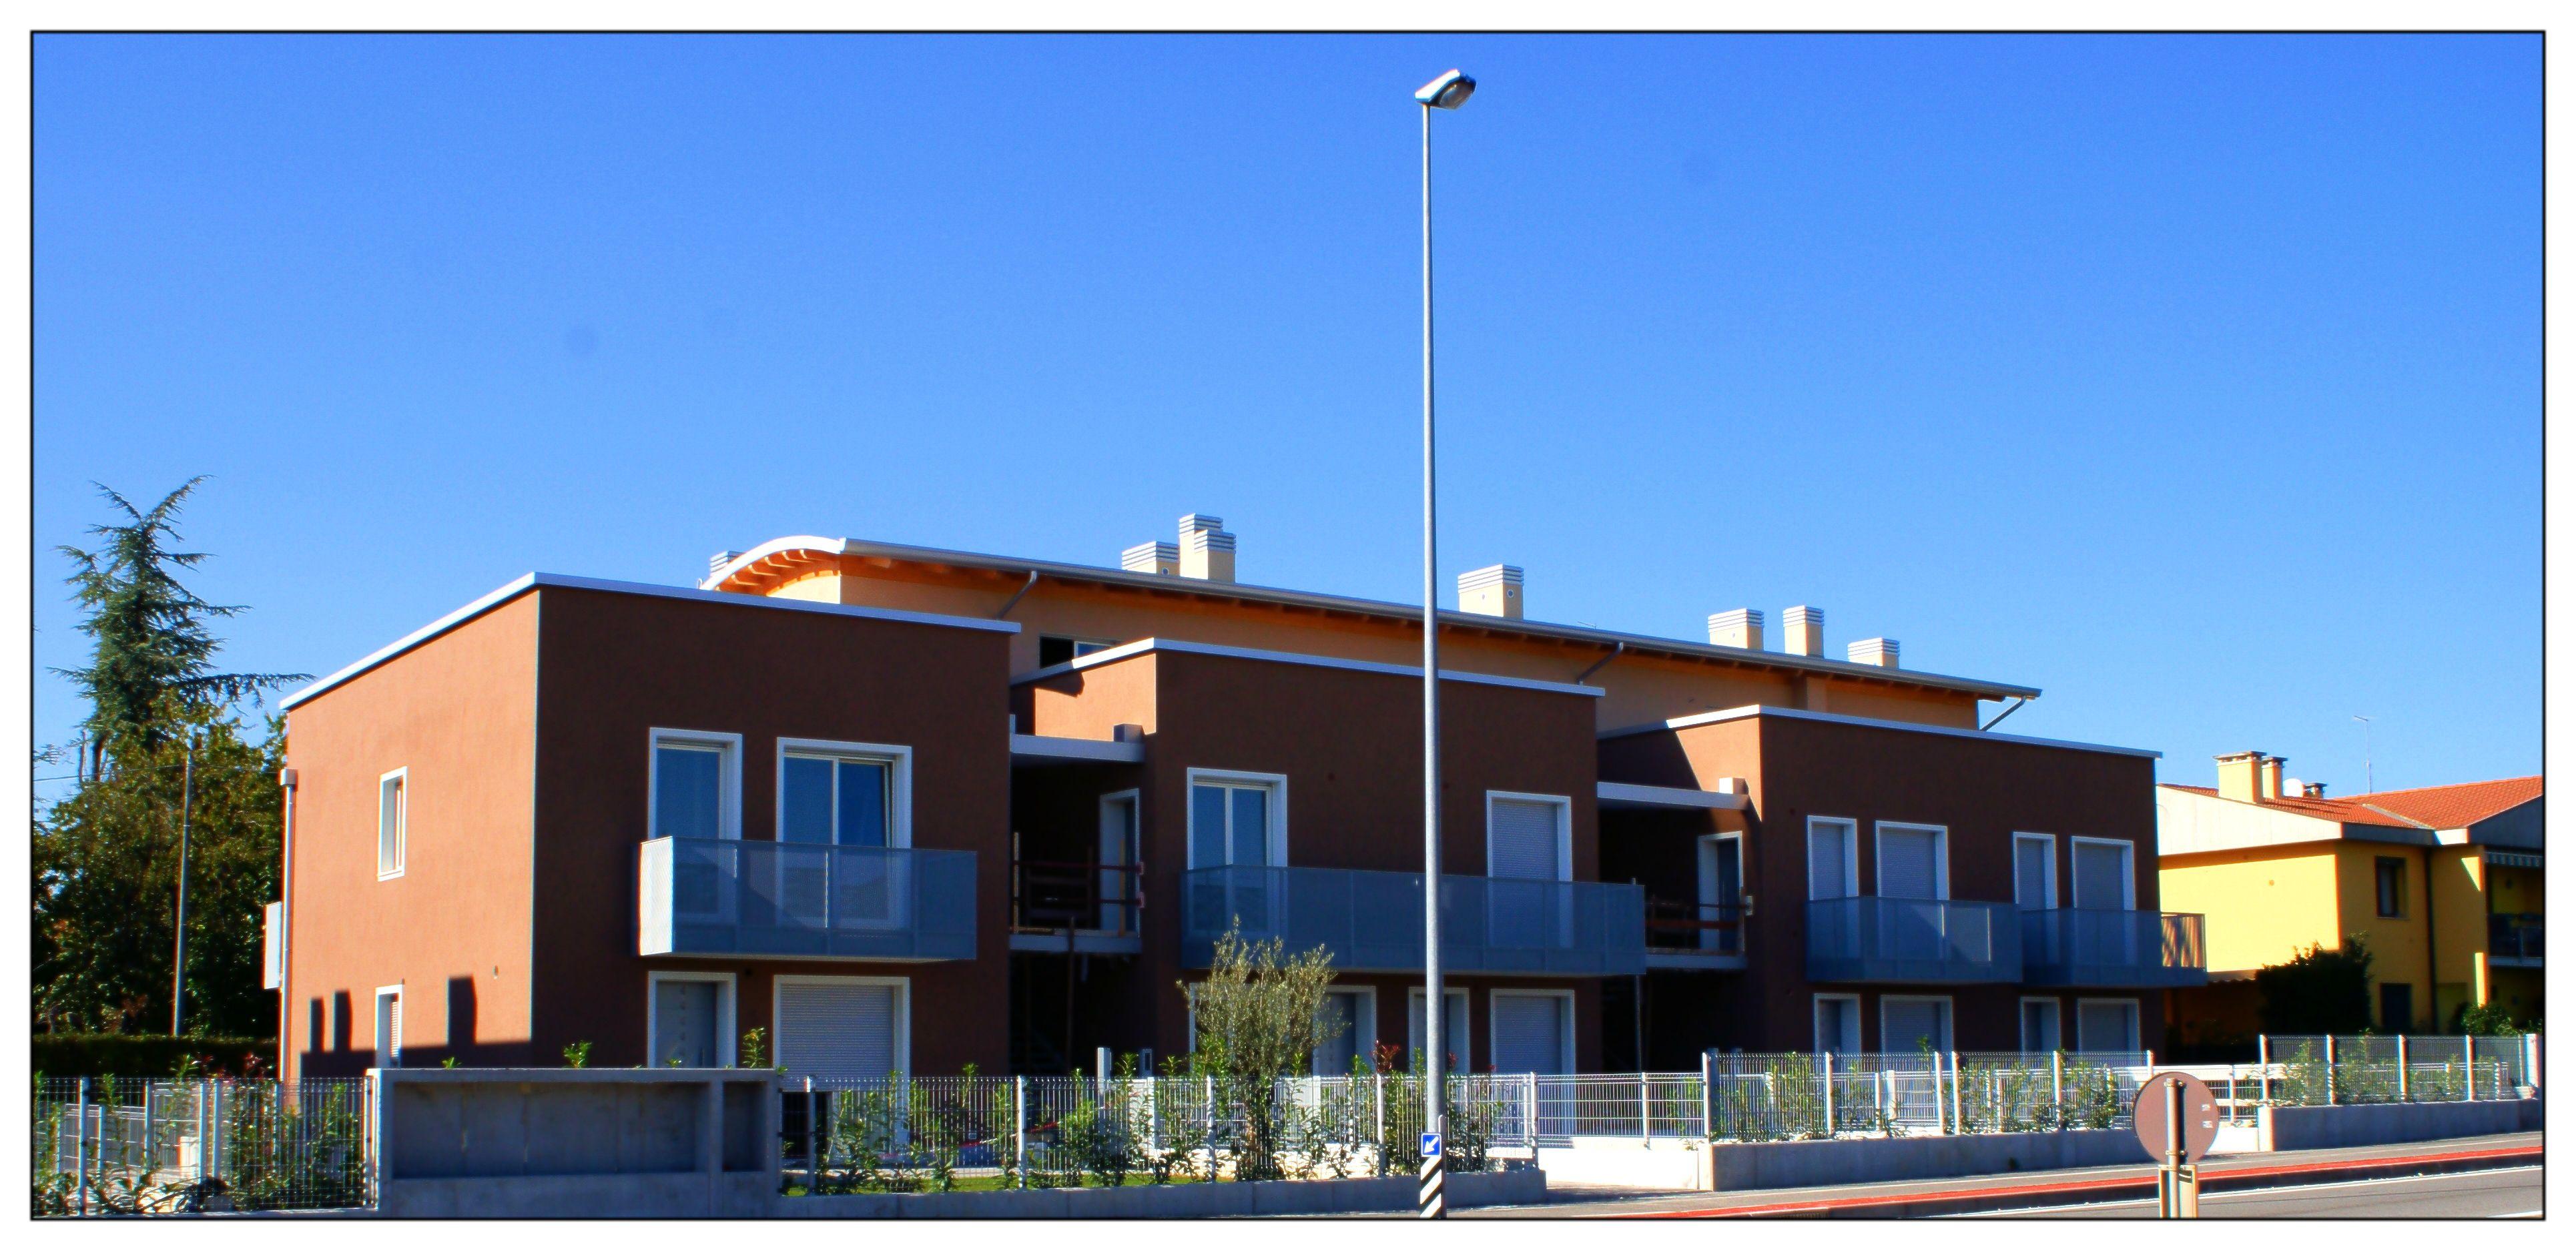 Klima Style - Appartamenti certificati CasaClima a Dueville